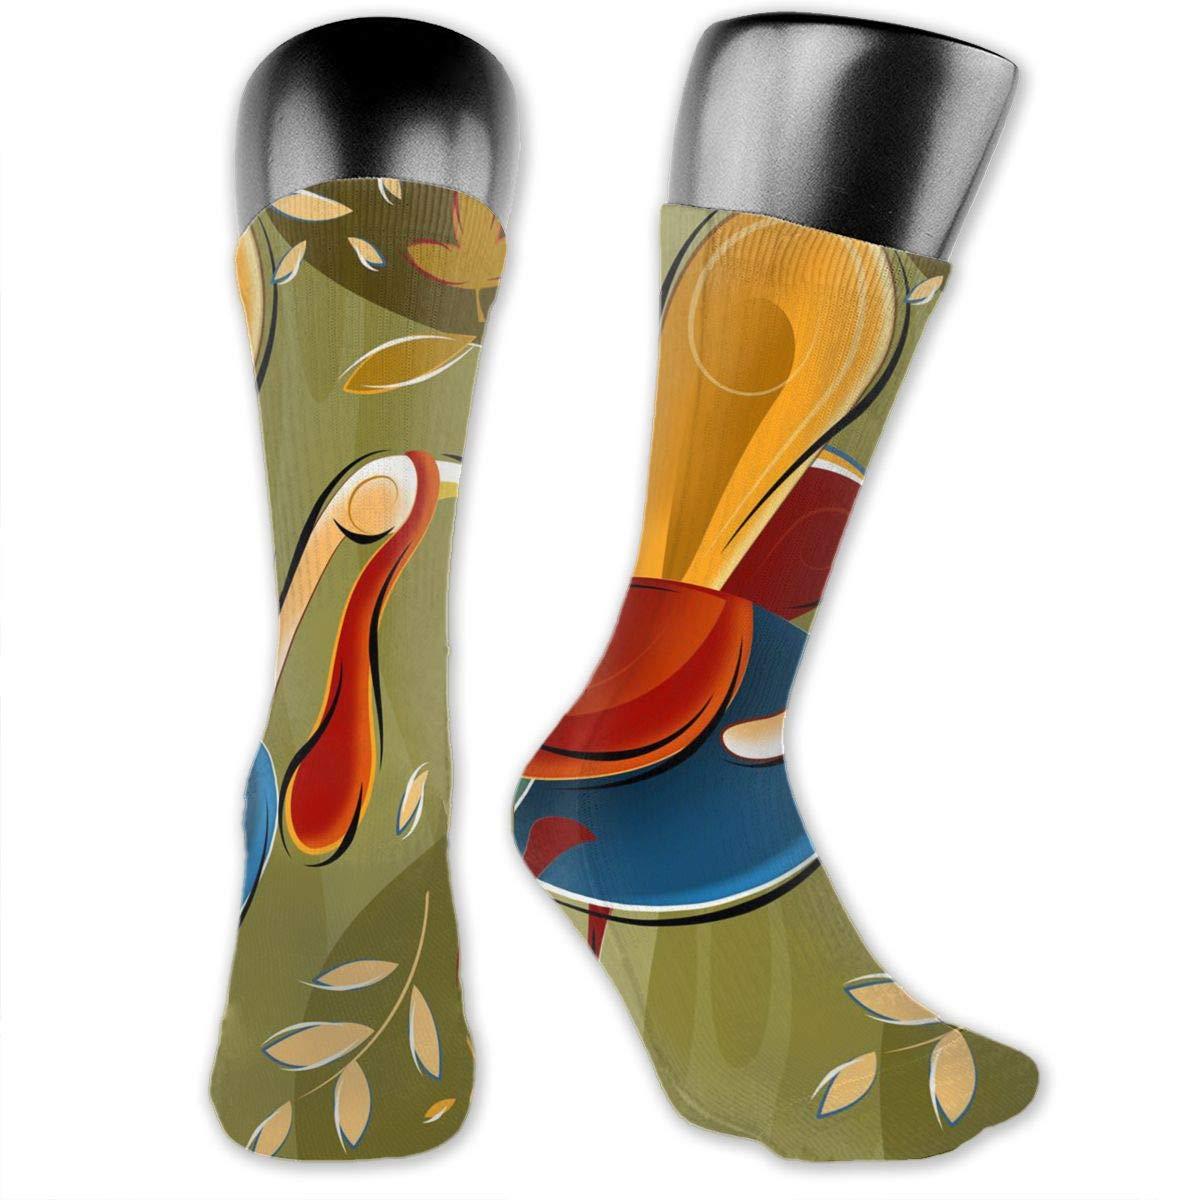 Athletic Socks Autumn Turkey Over The Calf Compression Socks